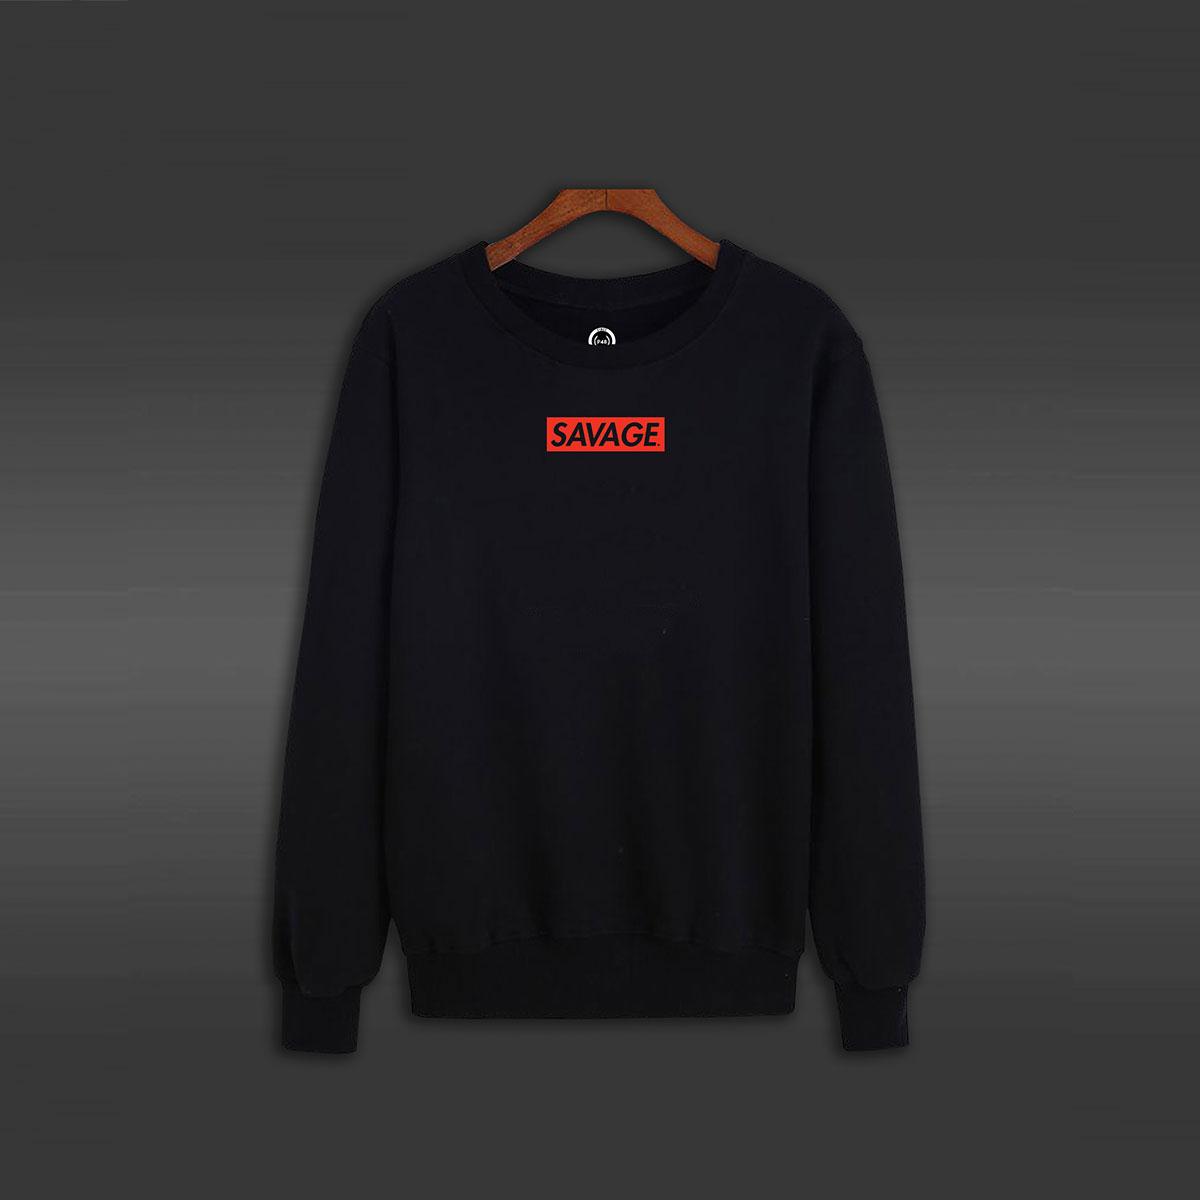 Savage Crew Neck Sweater - Black